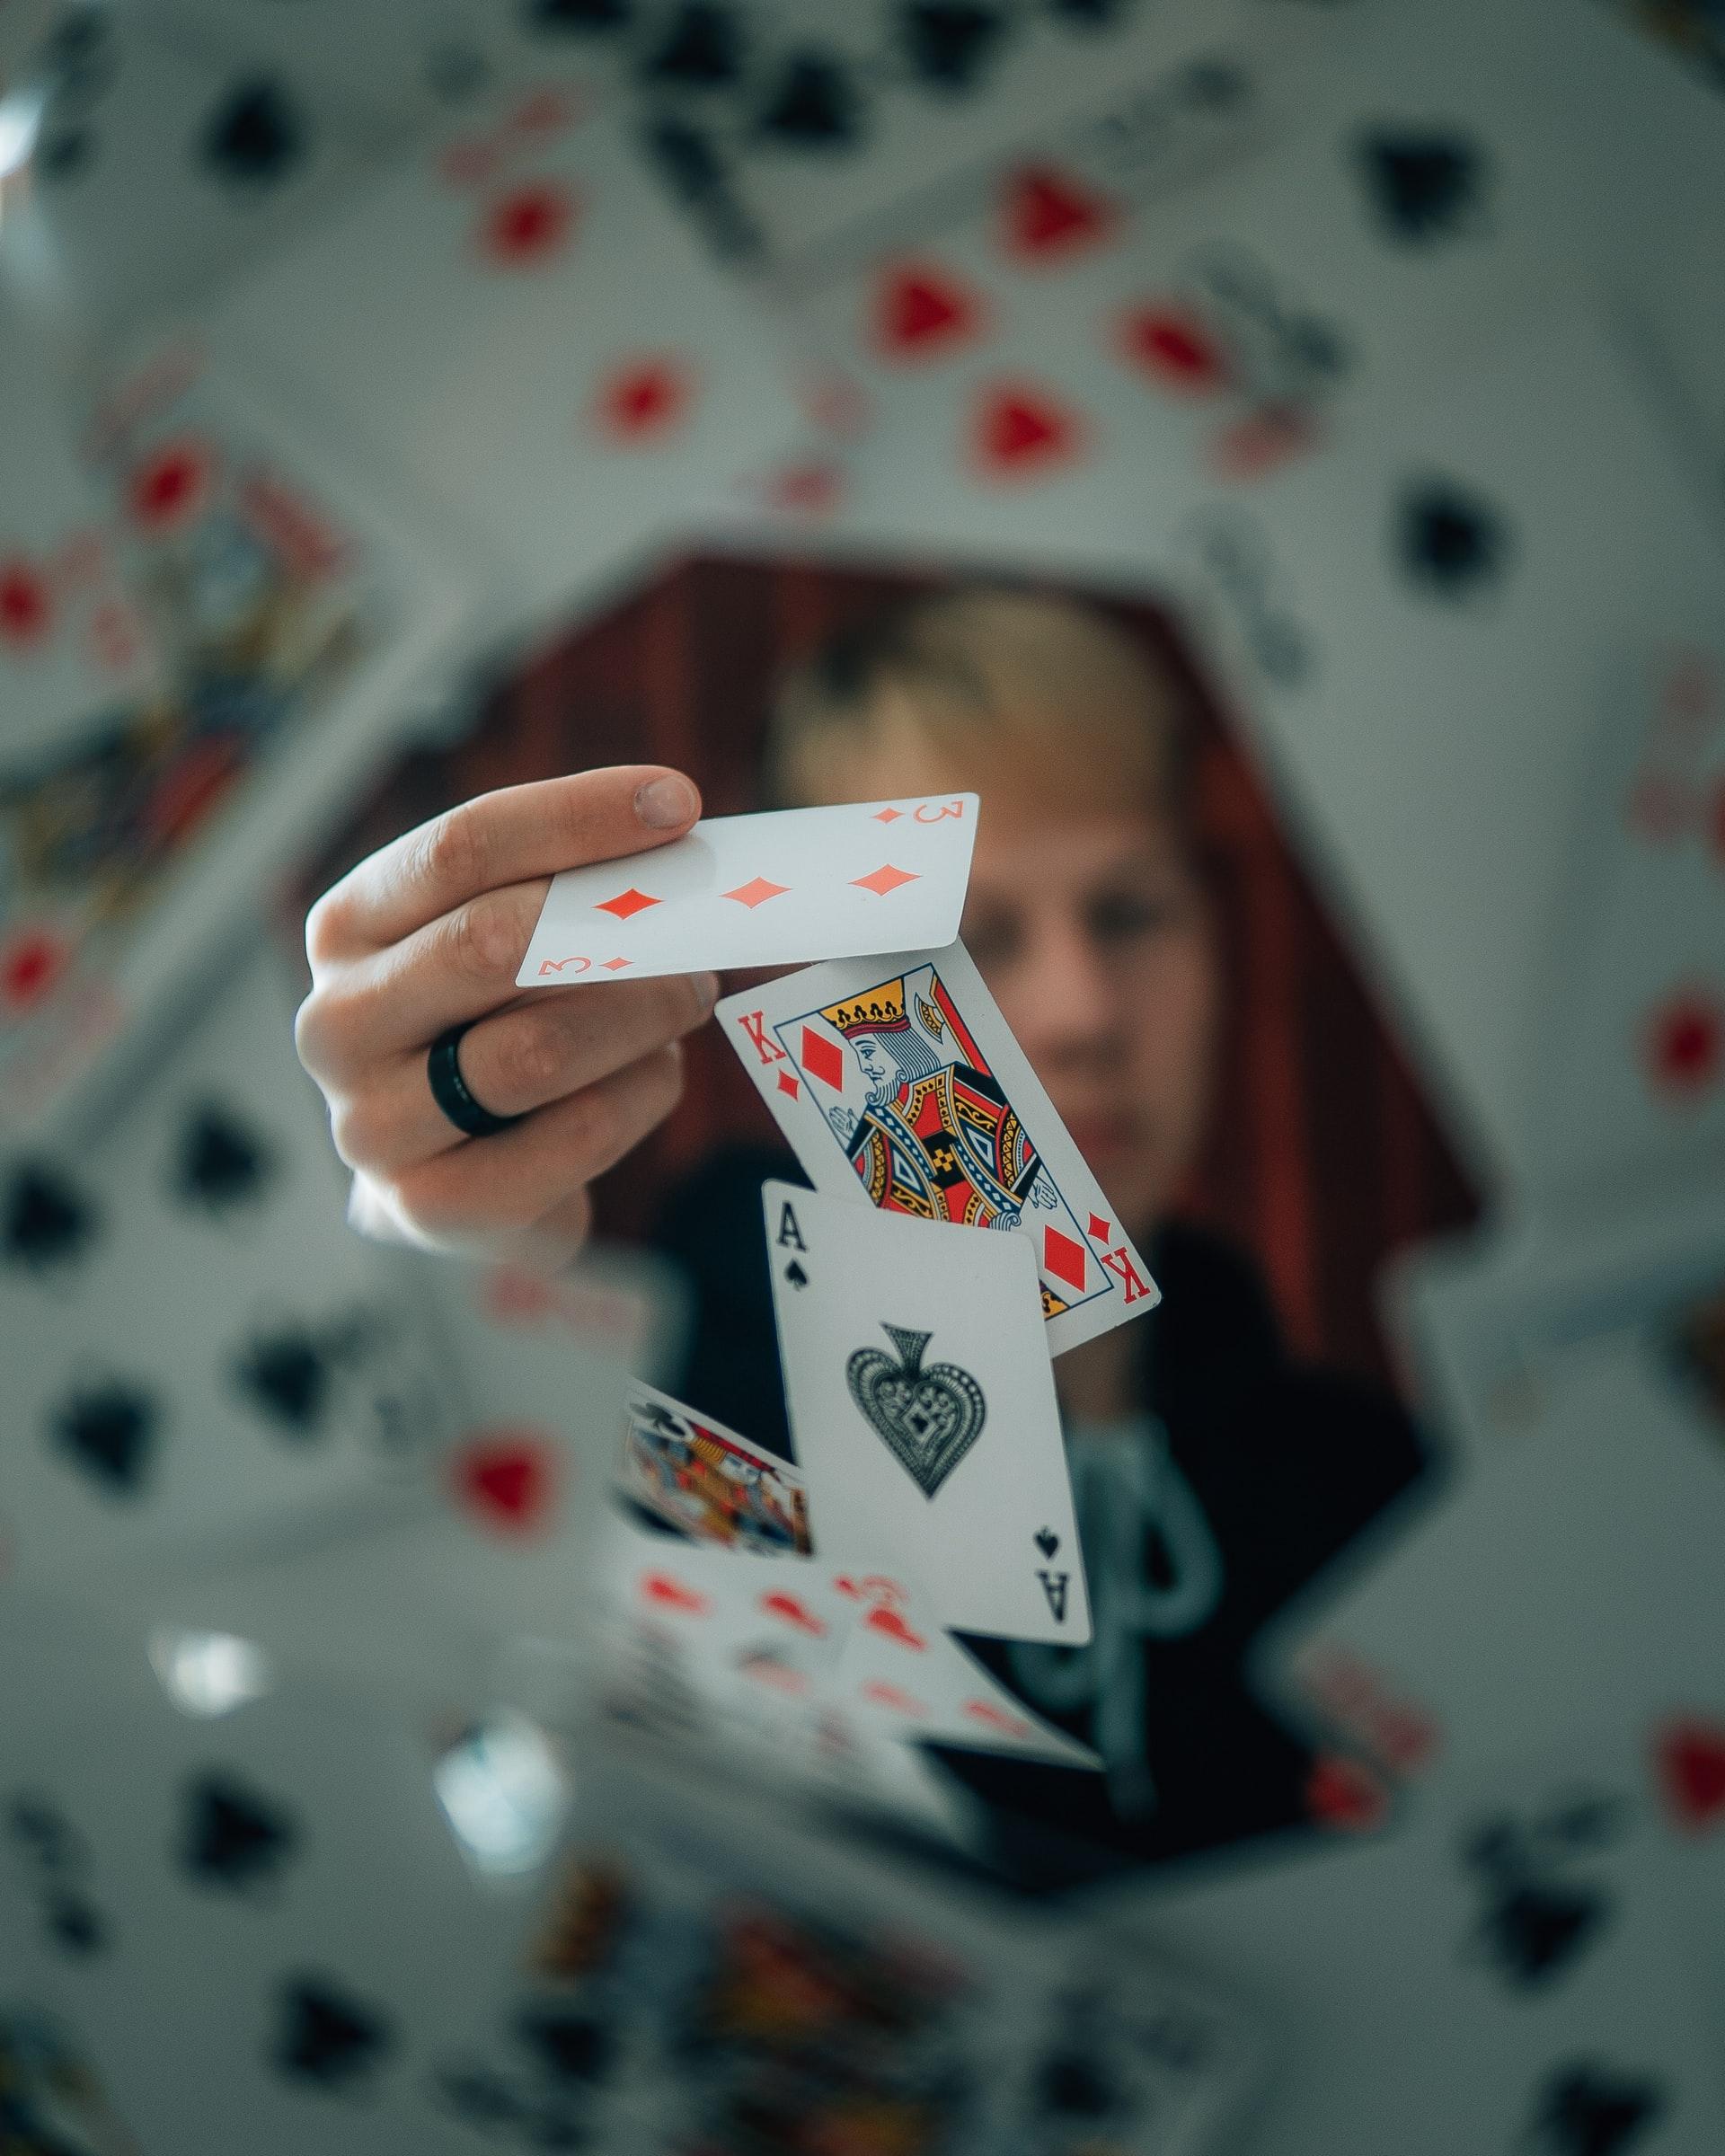 How Data Modeling Can Predict Gambling Behaviors